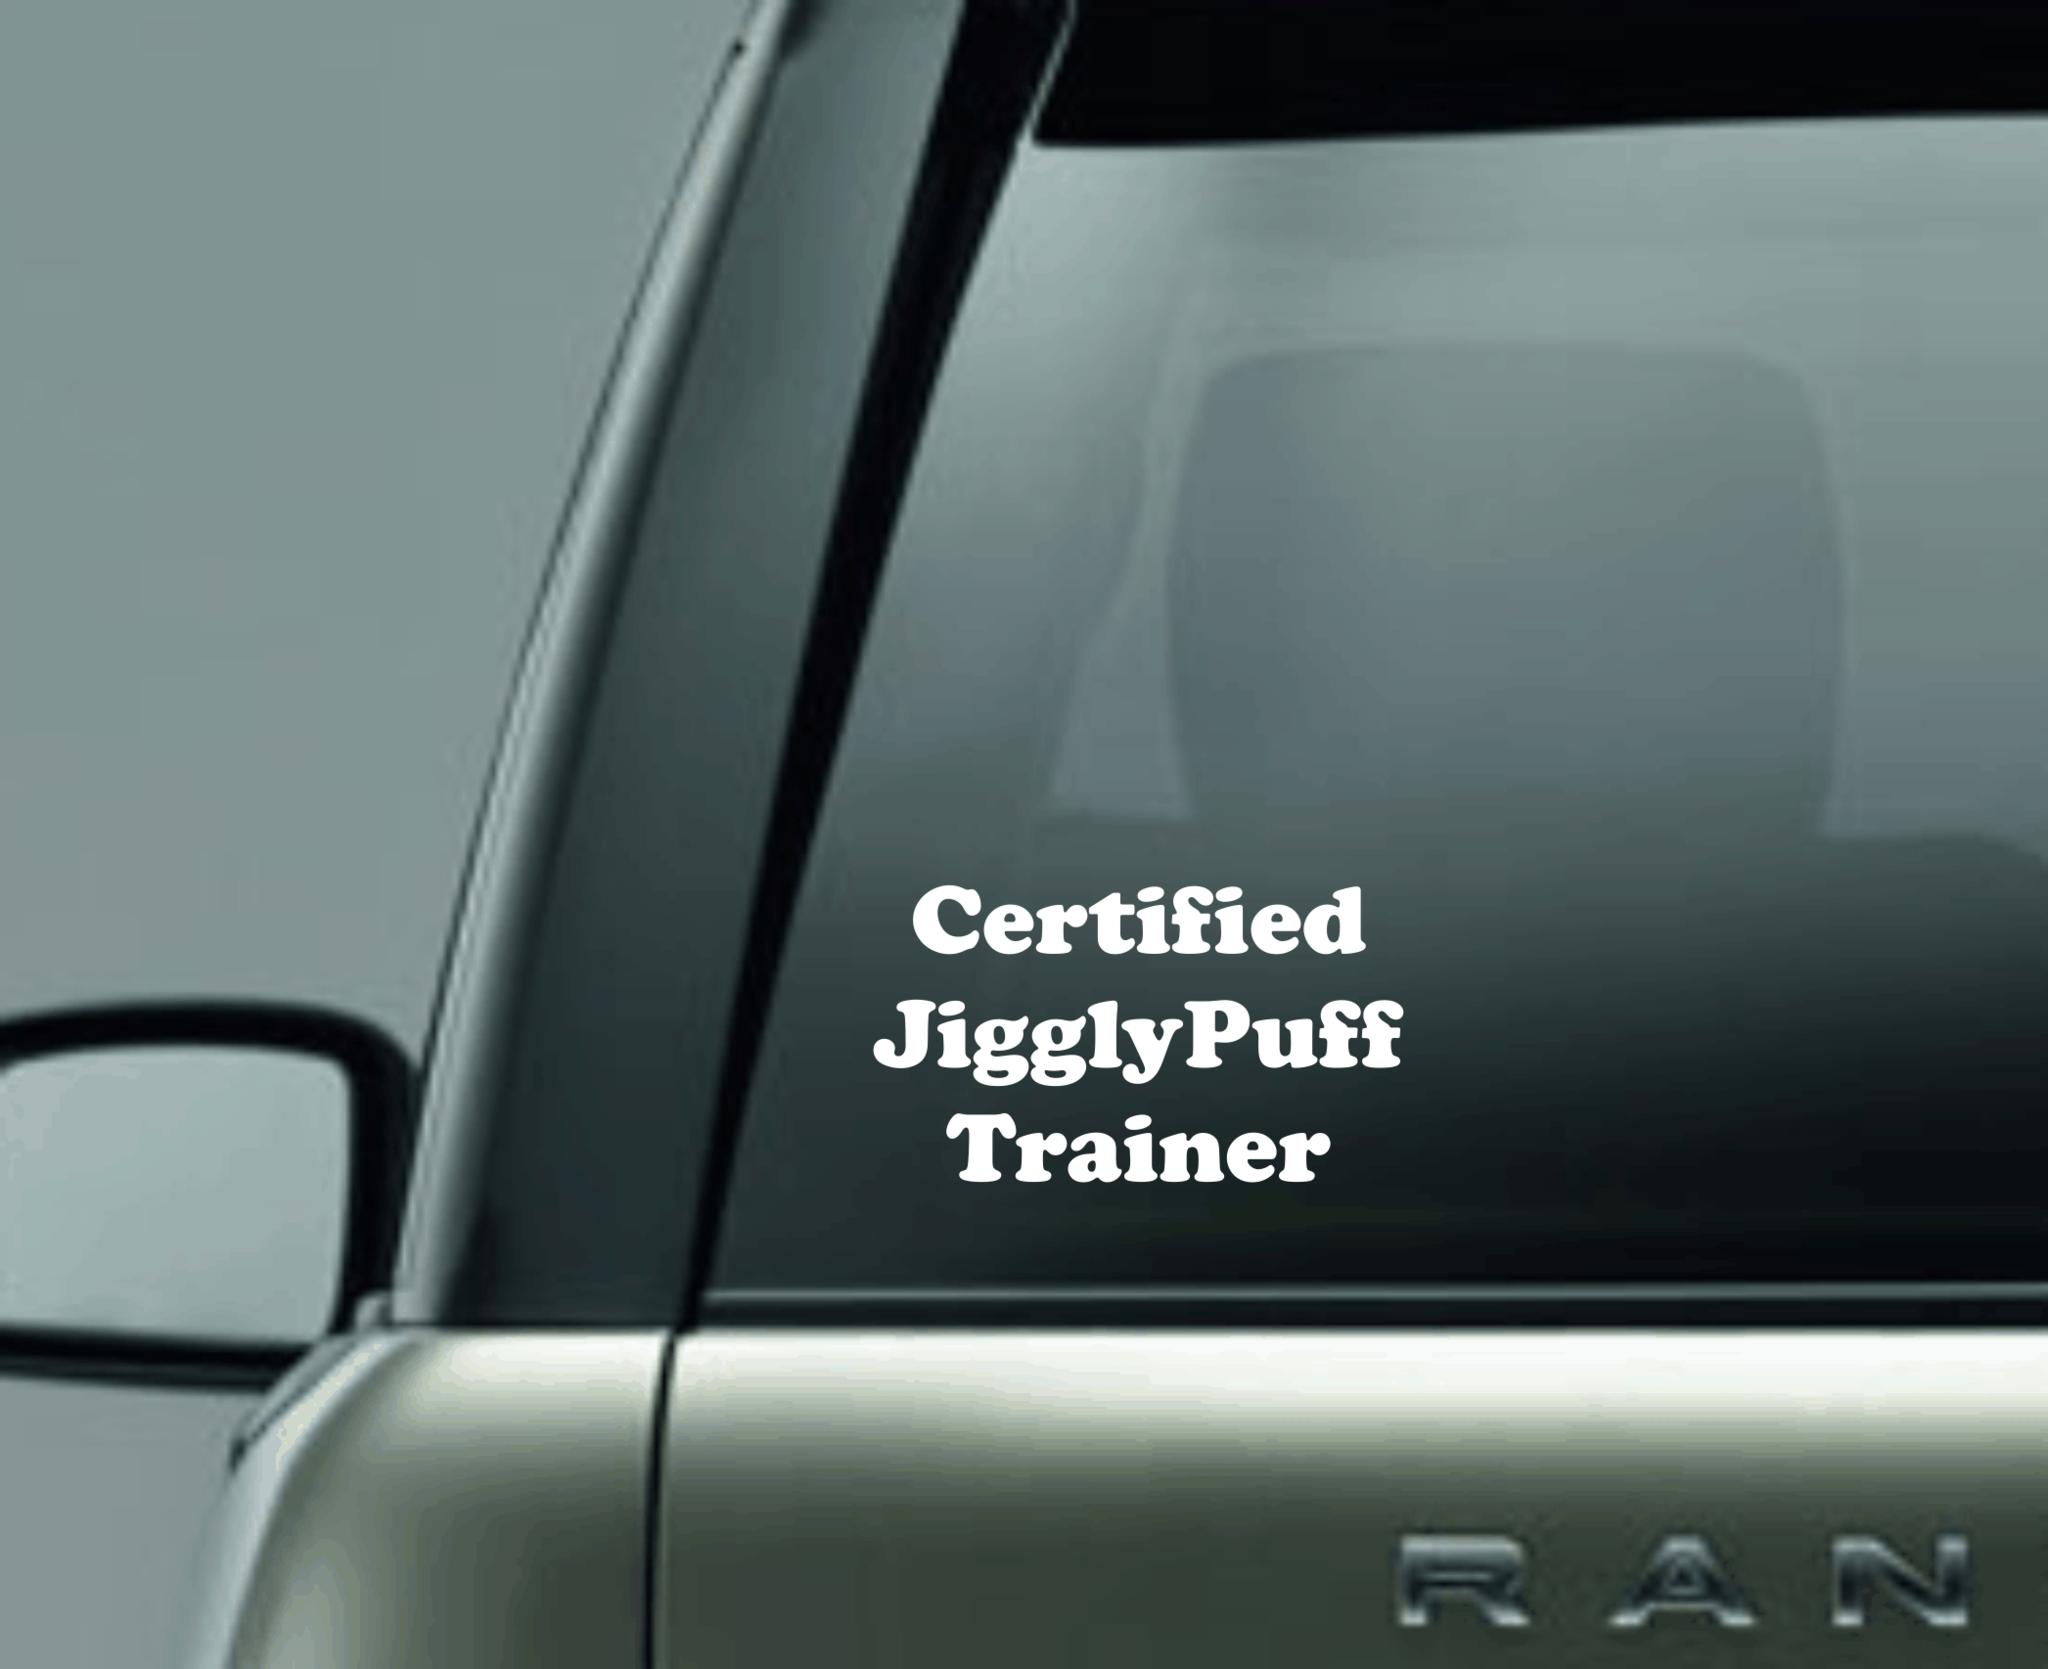 'Certified JigglyPuff Trainer' Car Decal / Sticker